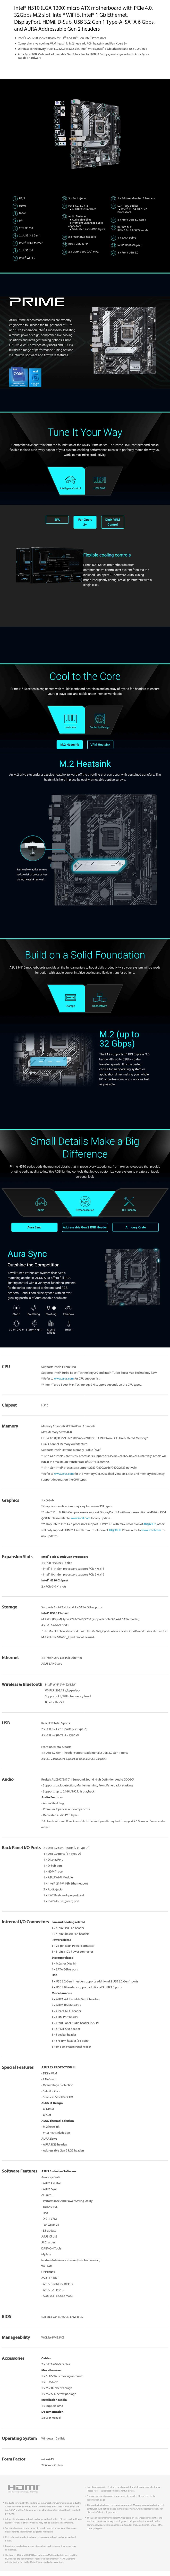 ASUS PRIME H510M-A WIFI LGA 1200 Micro-ATX Motherboard - Desktop Overview 1